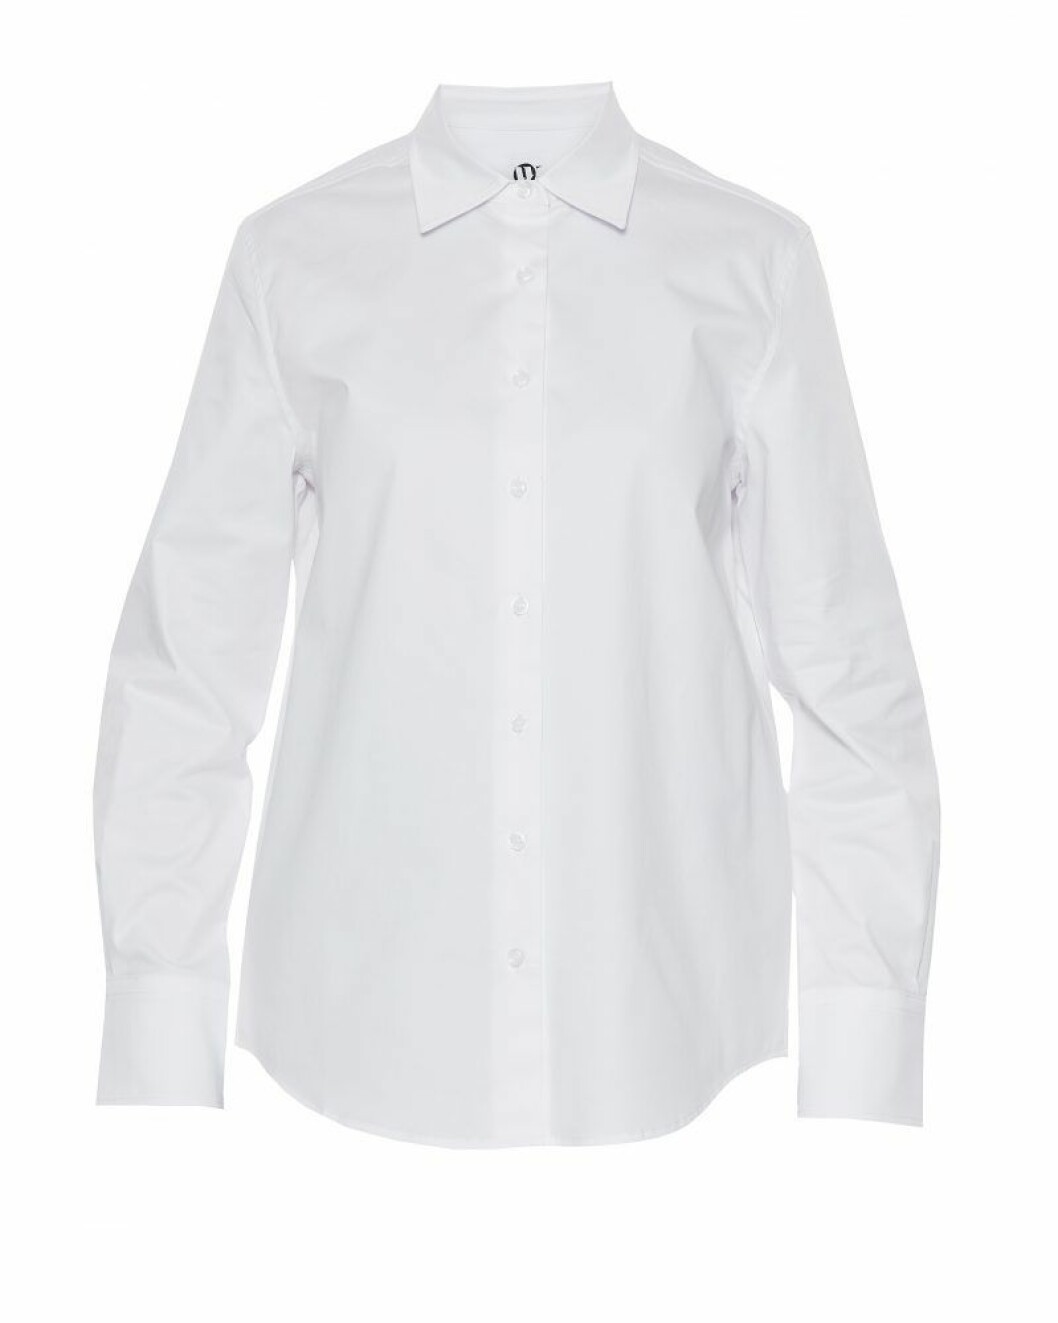 Wakakuu Icons vårkollektion: Vit skjorta